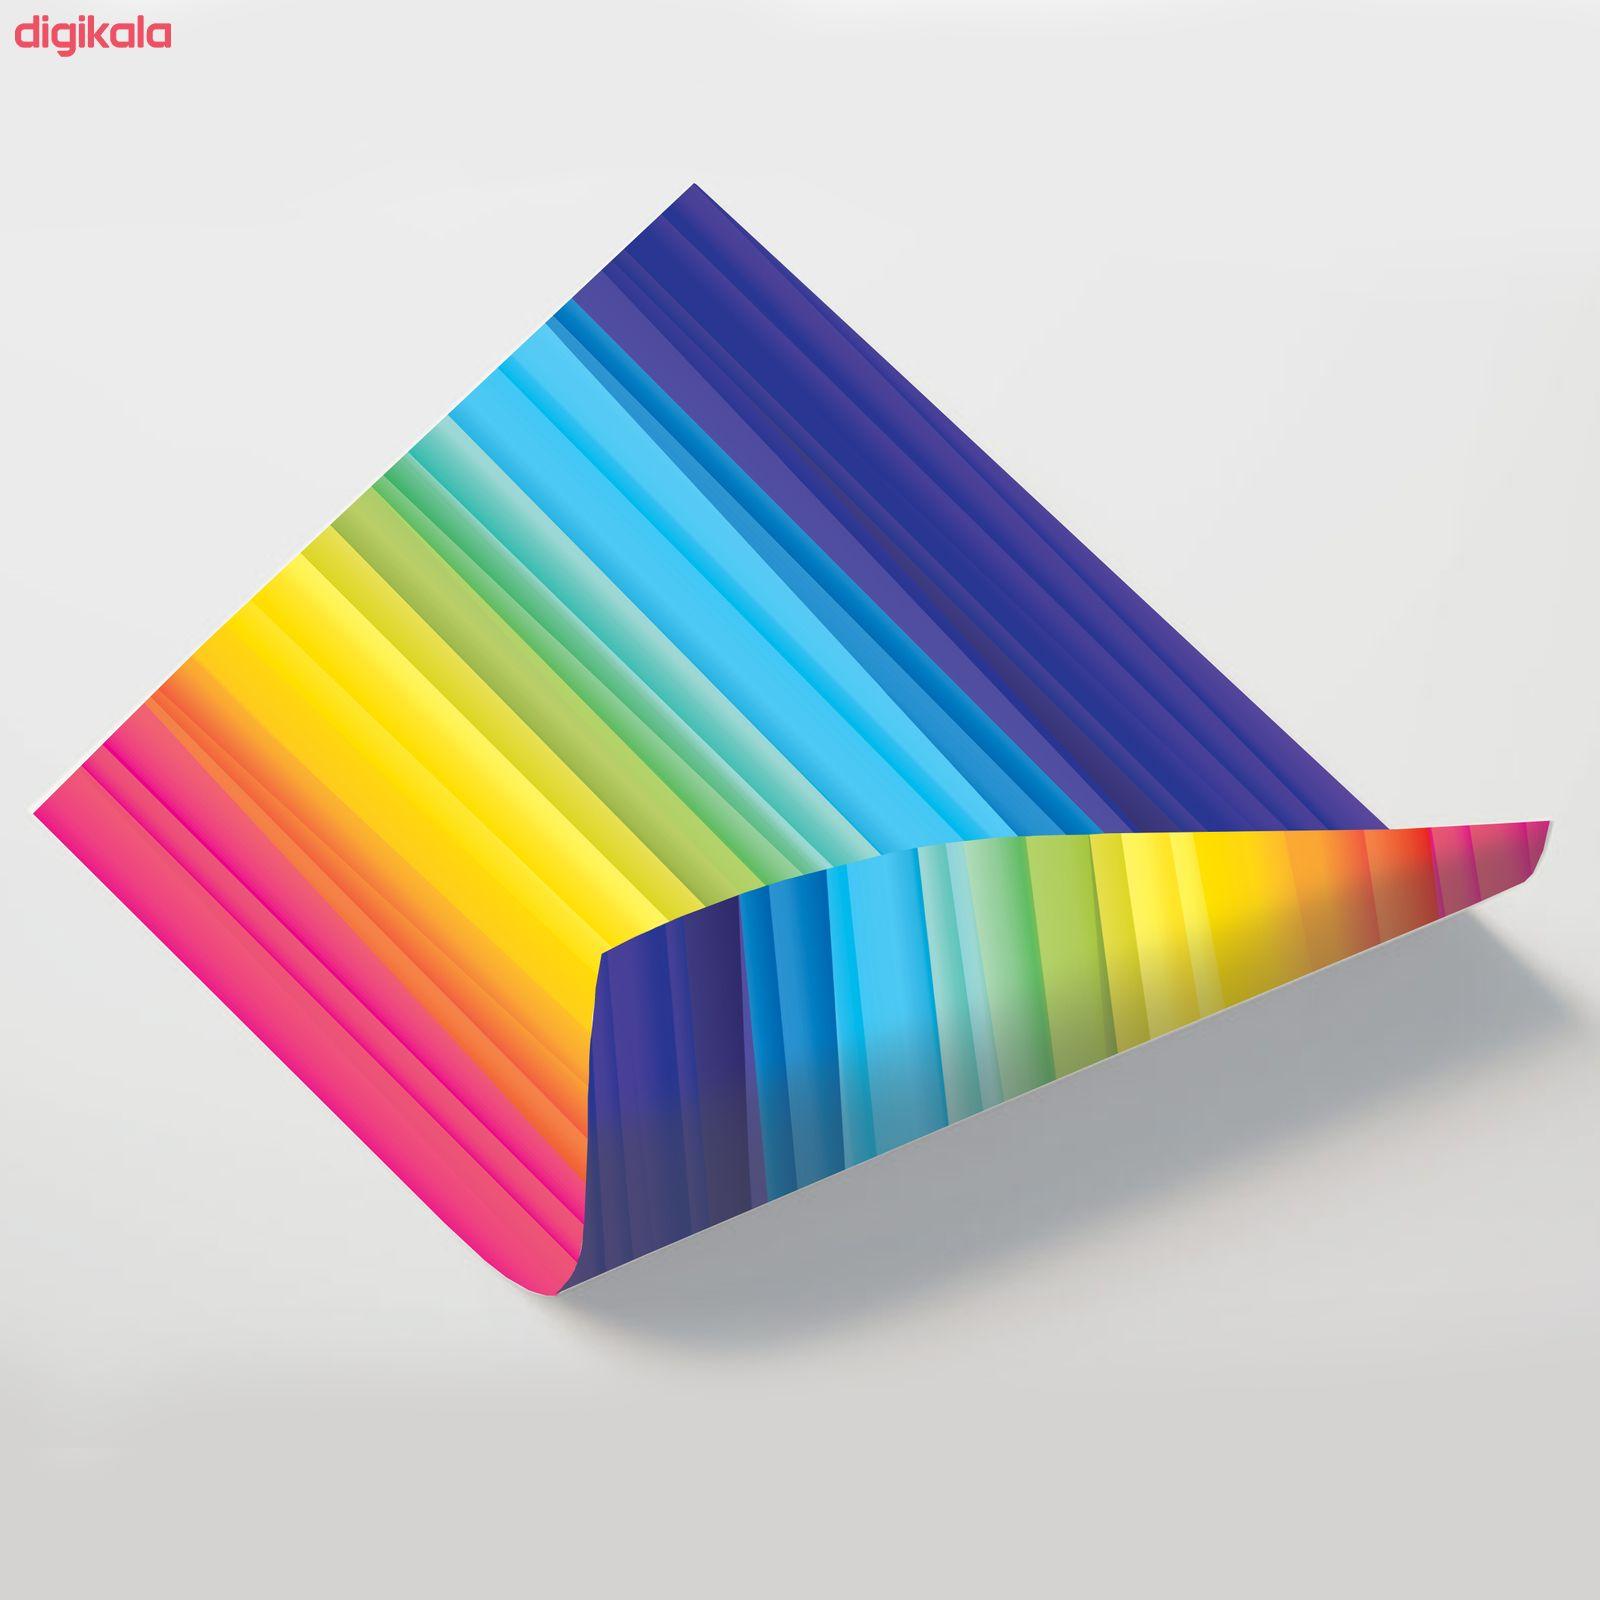 کاغذ رنگی A4 مستر راد مدل رنگارنگ بسته 10 عددی main 1 12